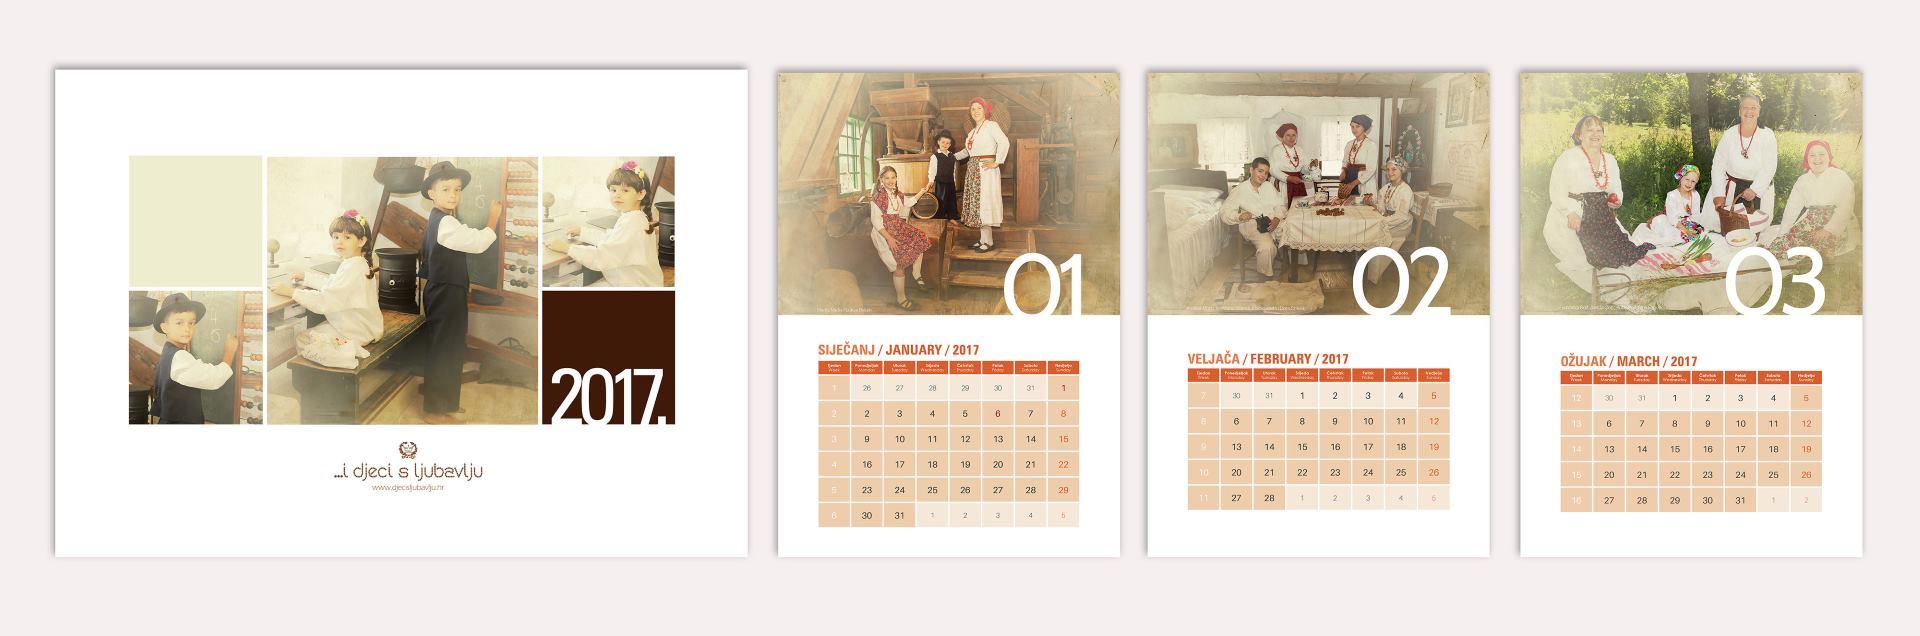 GORSKOM KOTARU S LJUBAVLJU Humanitarna akcija i kalendar za nabavku logopedske opreme za Grad Delnice